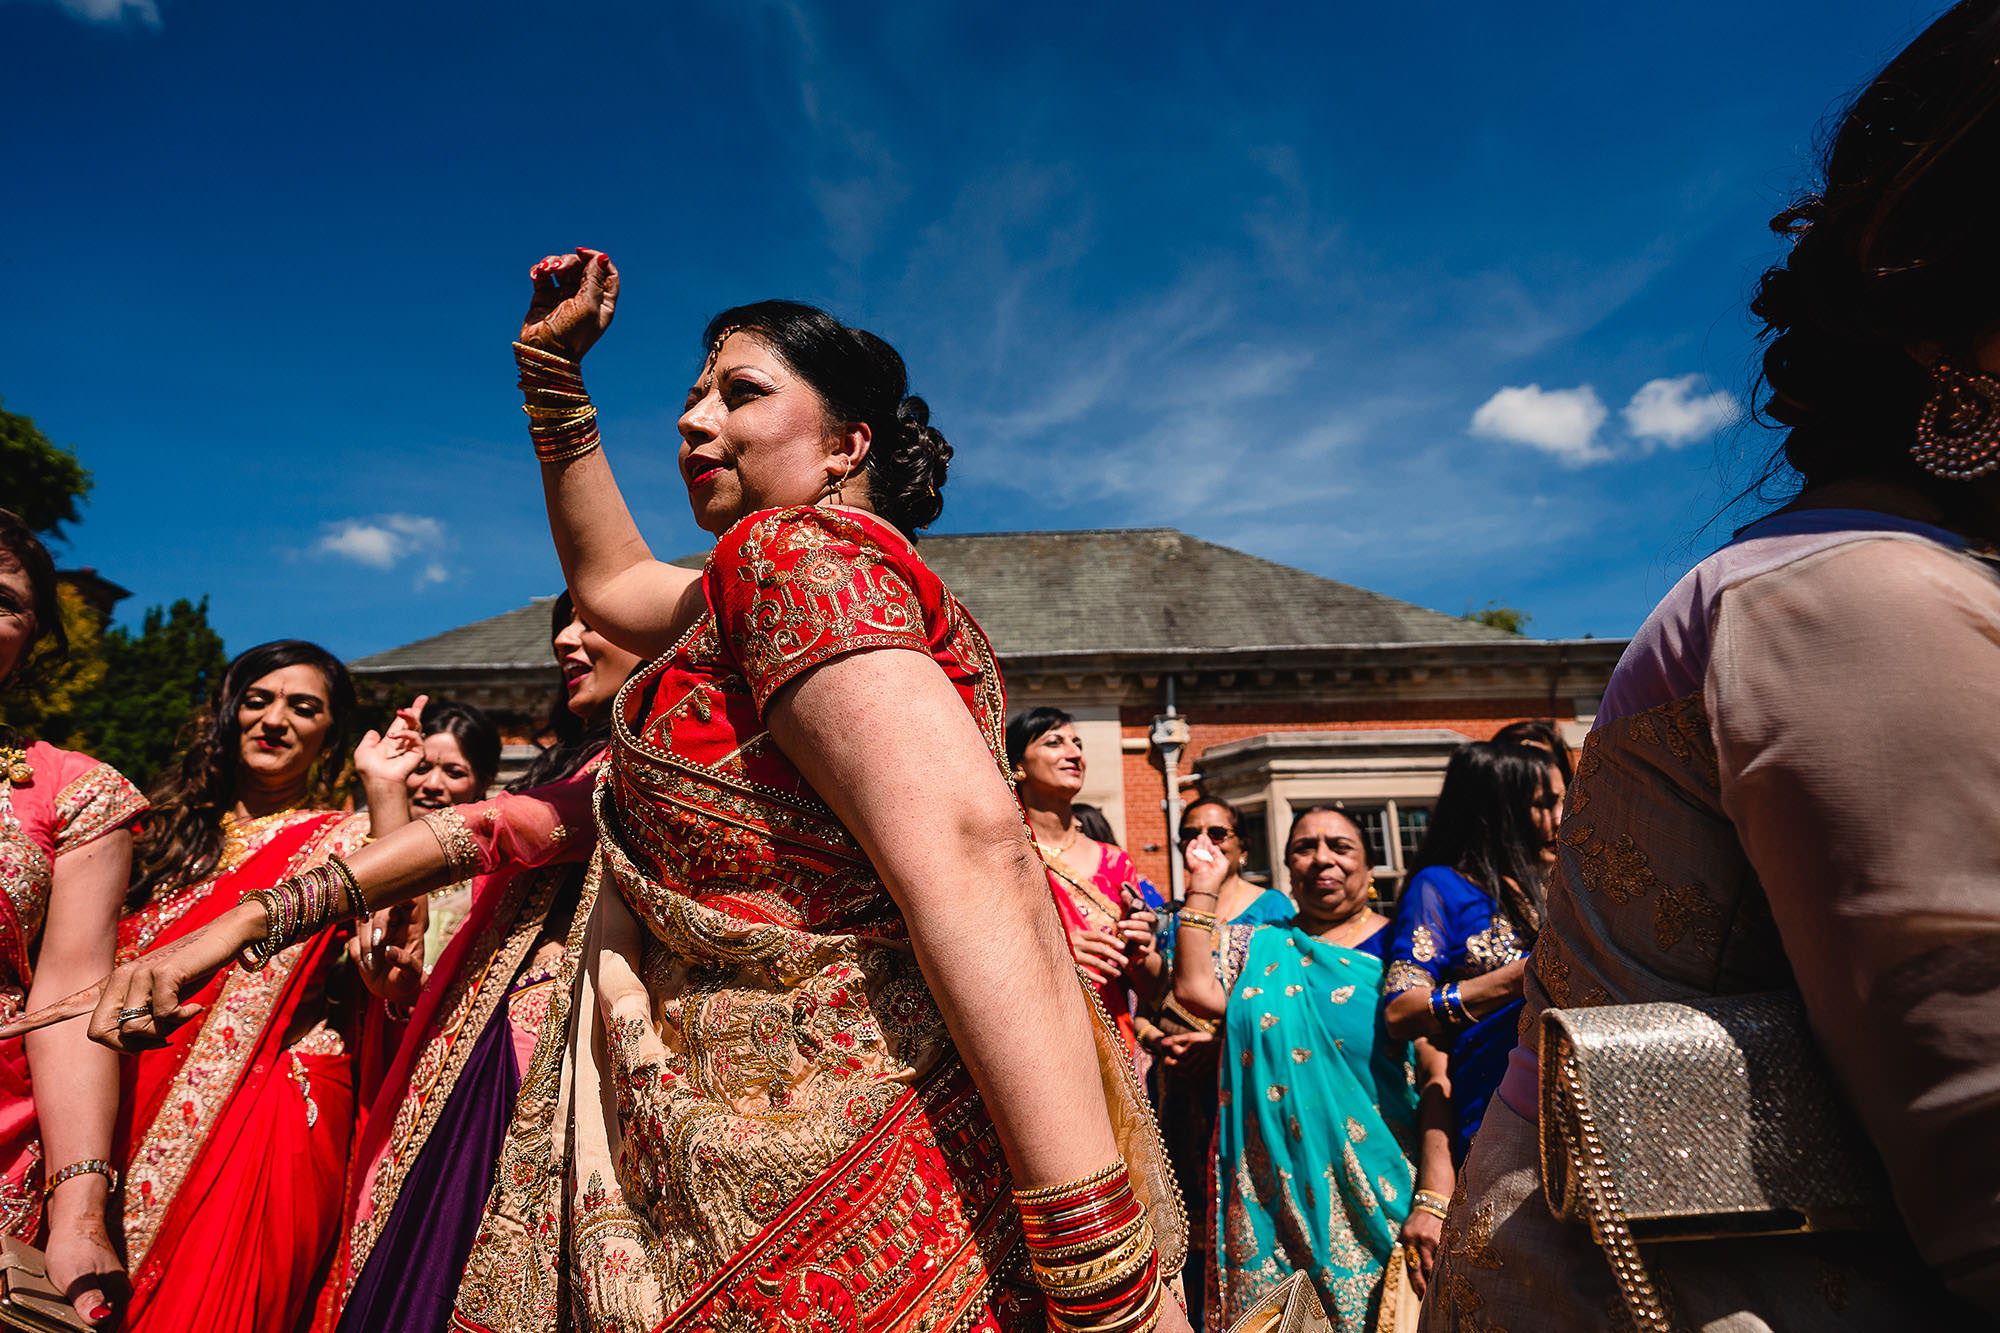 grooms mum dancing during entrance